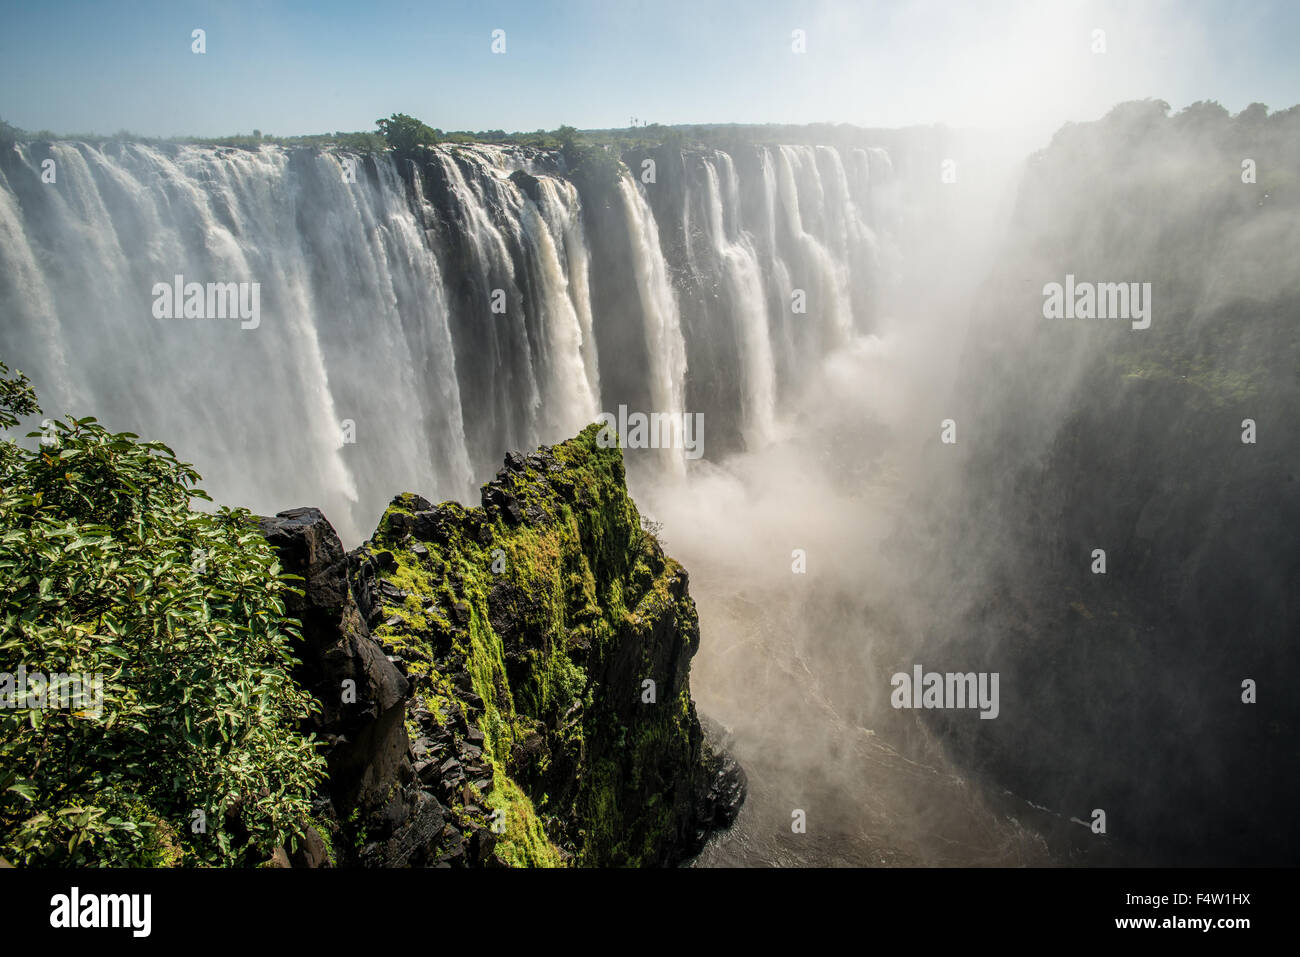 Victoria Falls, Zimbabwe - Victoria Falls Waterfall - Stock Image